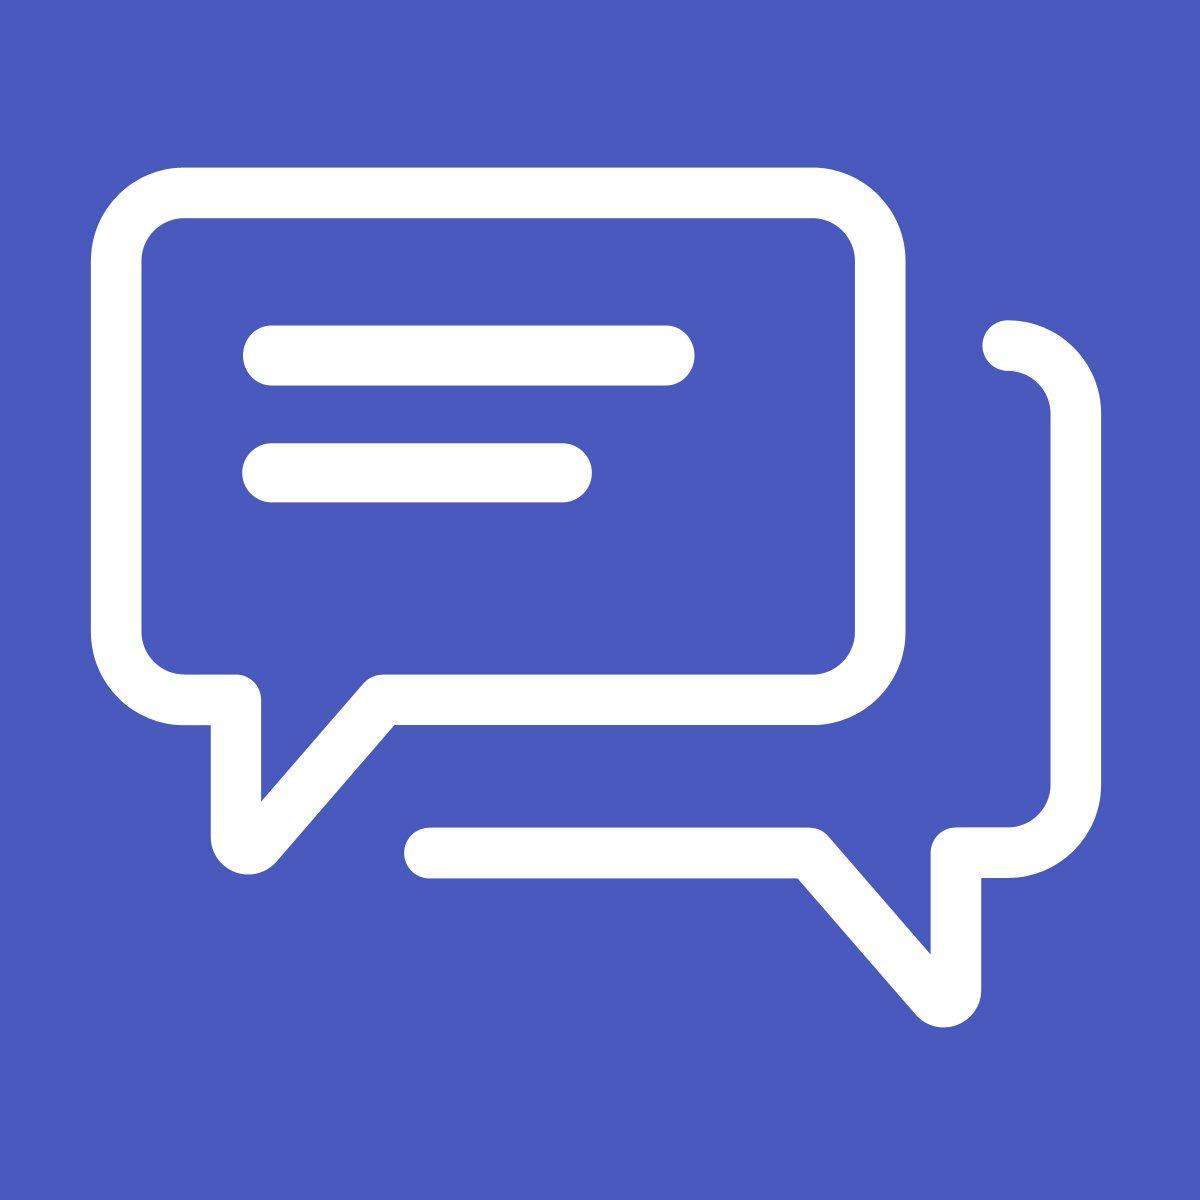 Shopify Social Share app by Softpulse infotech